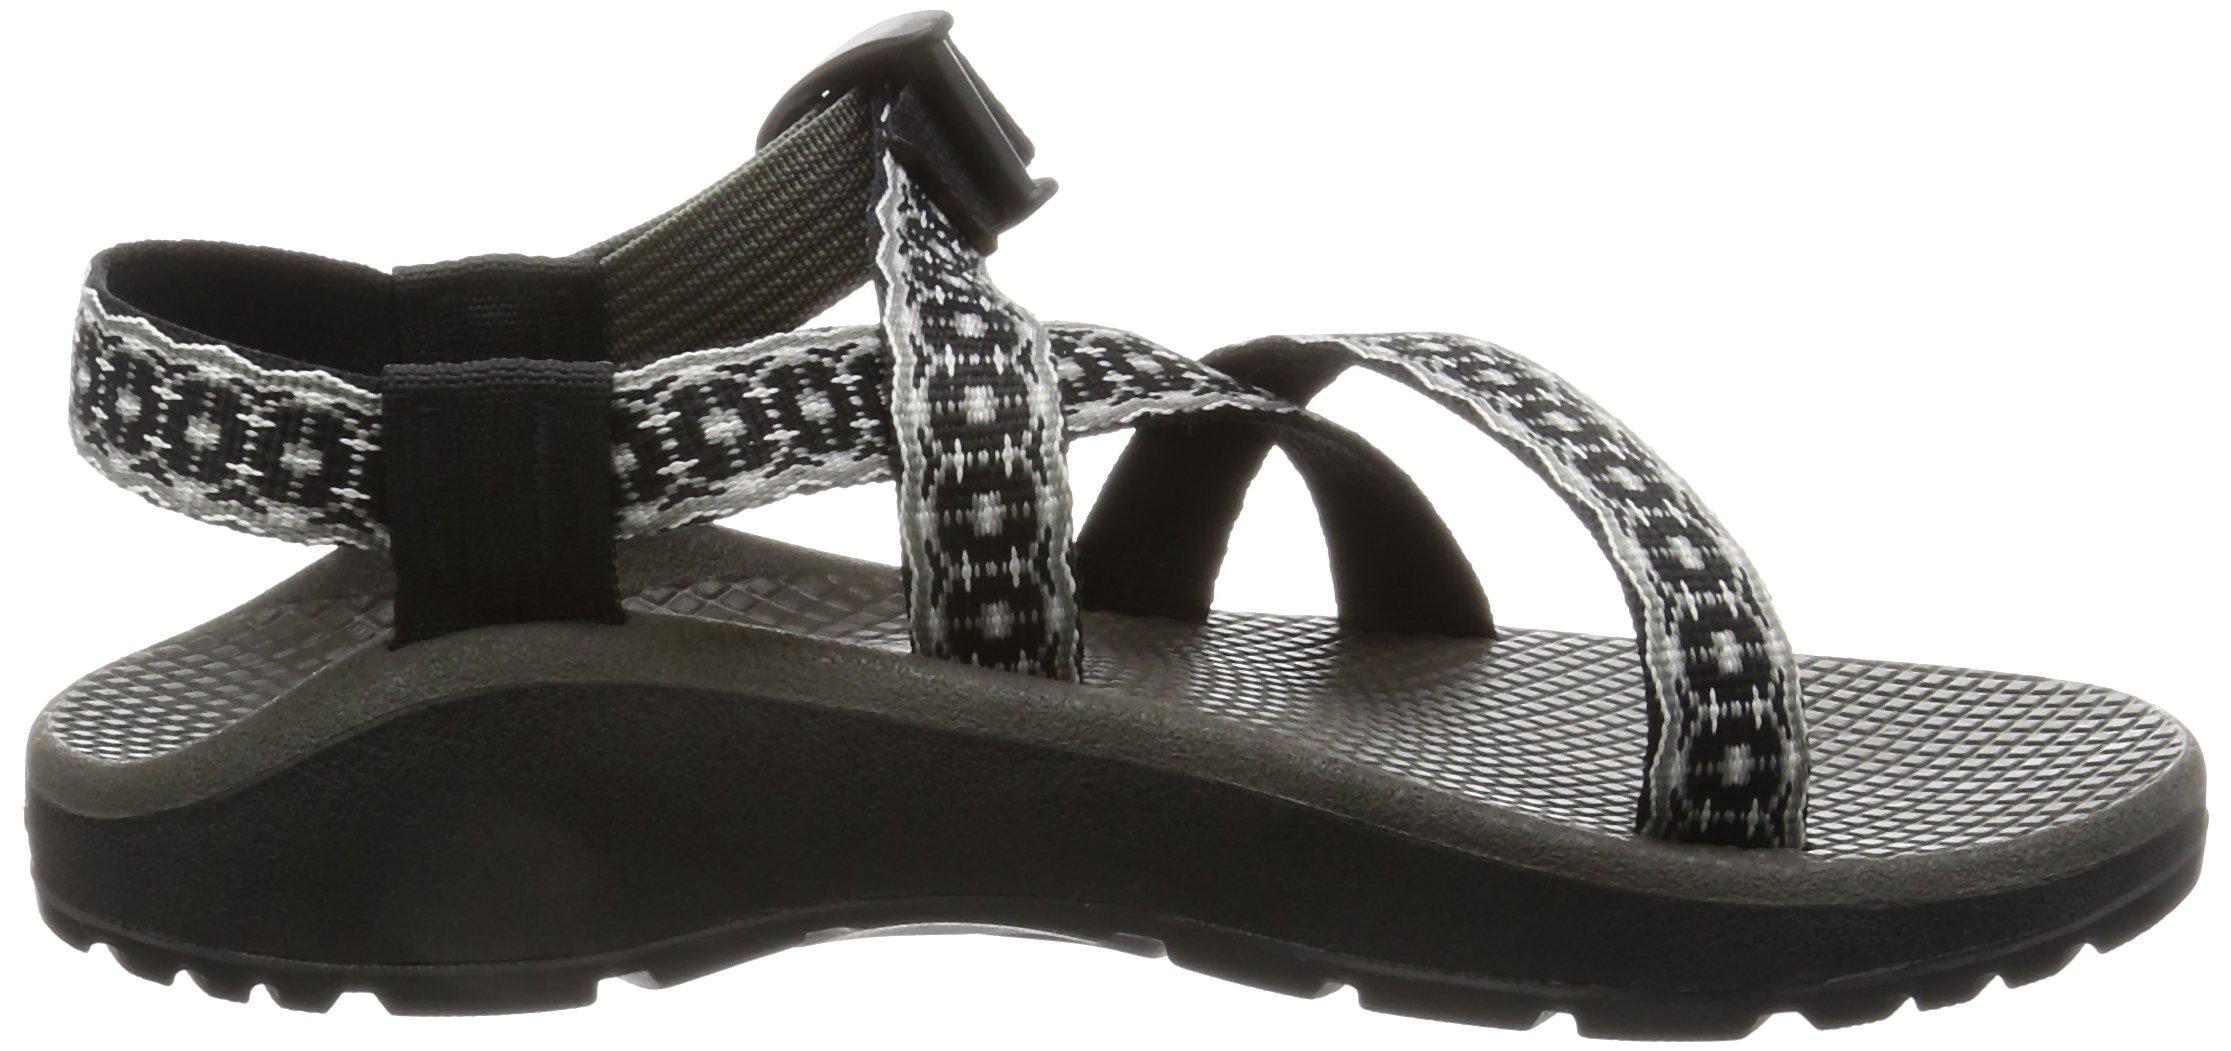 Chaco Women's Zcloud Sport Sandal, Venetian Black, 9 M US by Chaco (Image #7)